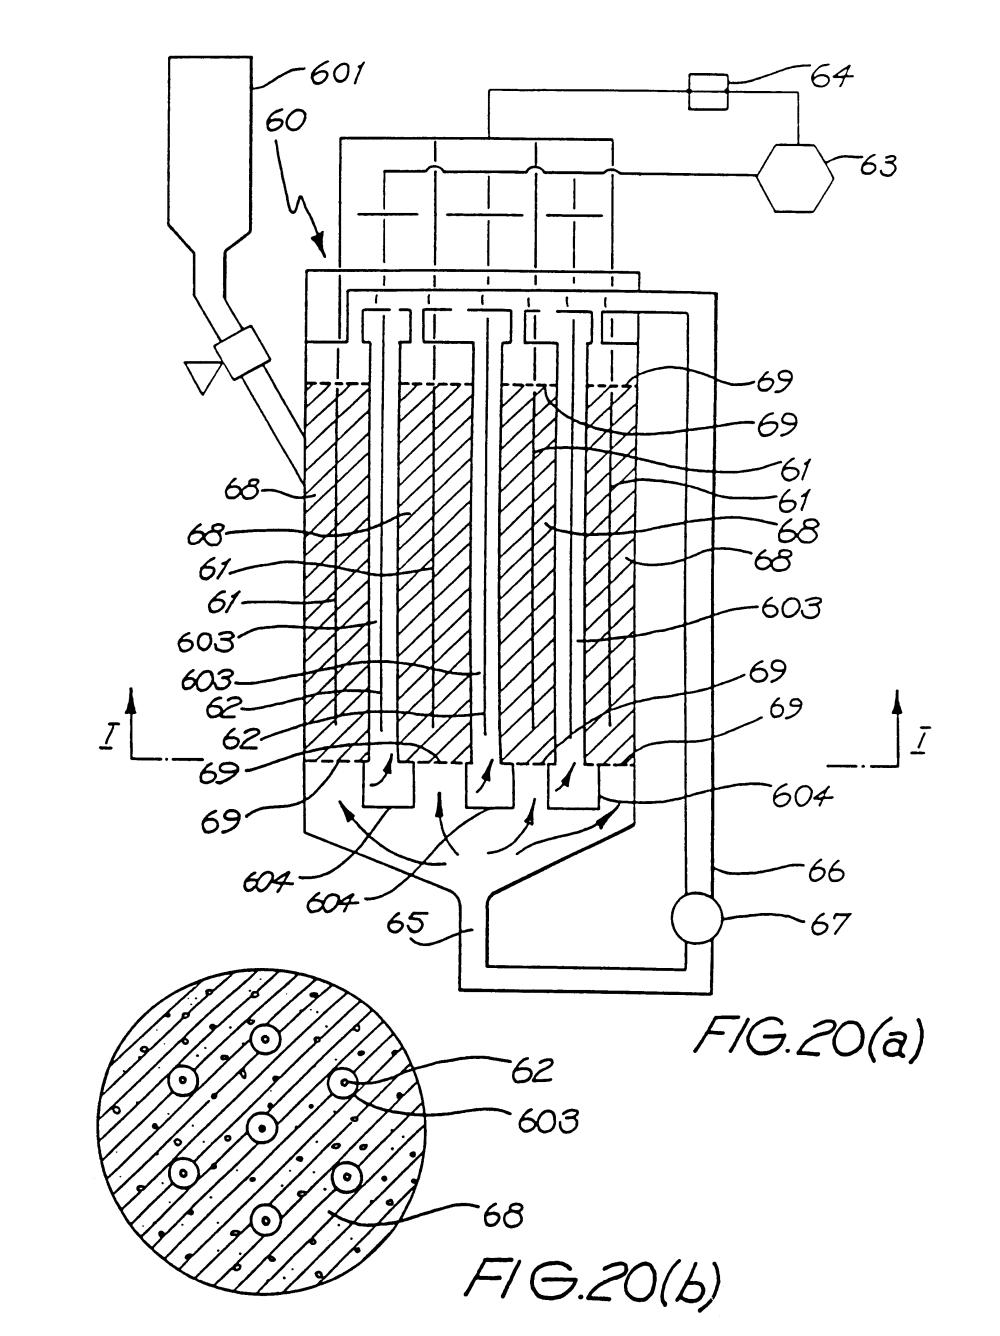 medium resolution of hilux trailer plug wiring diagram wiring diagrams source us06562514 20030513 d00020 patent us6562514 ilized vanadium